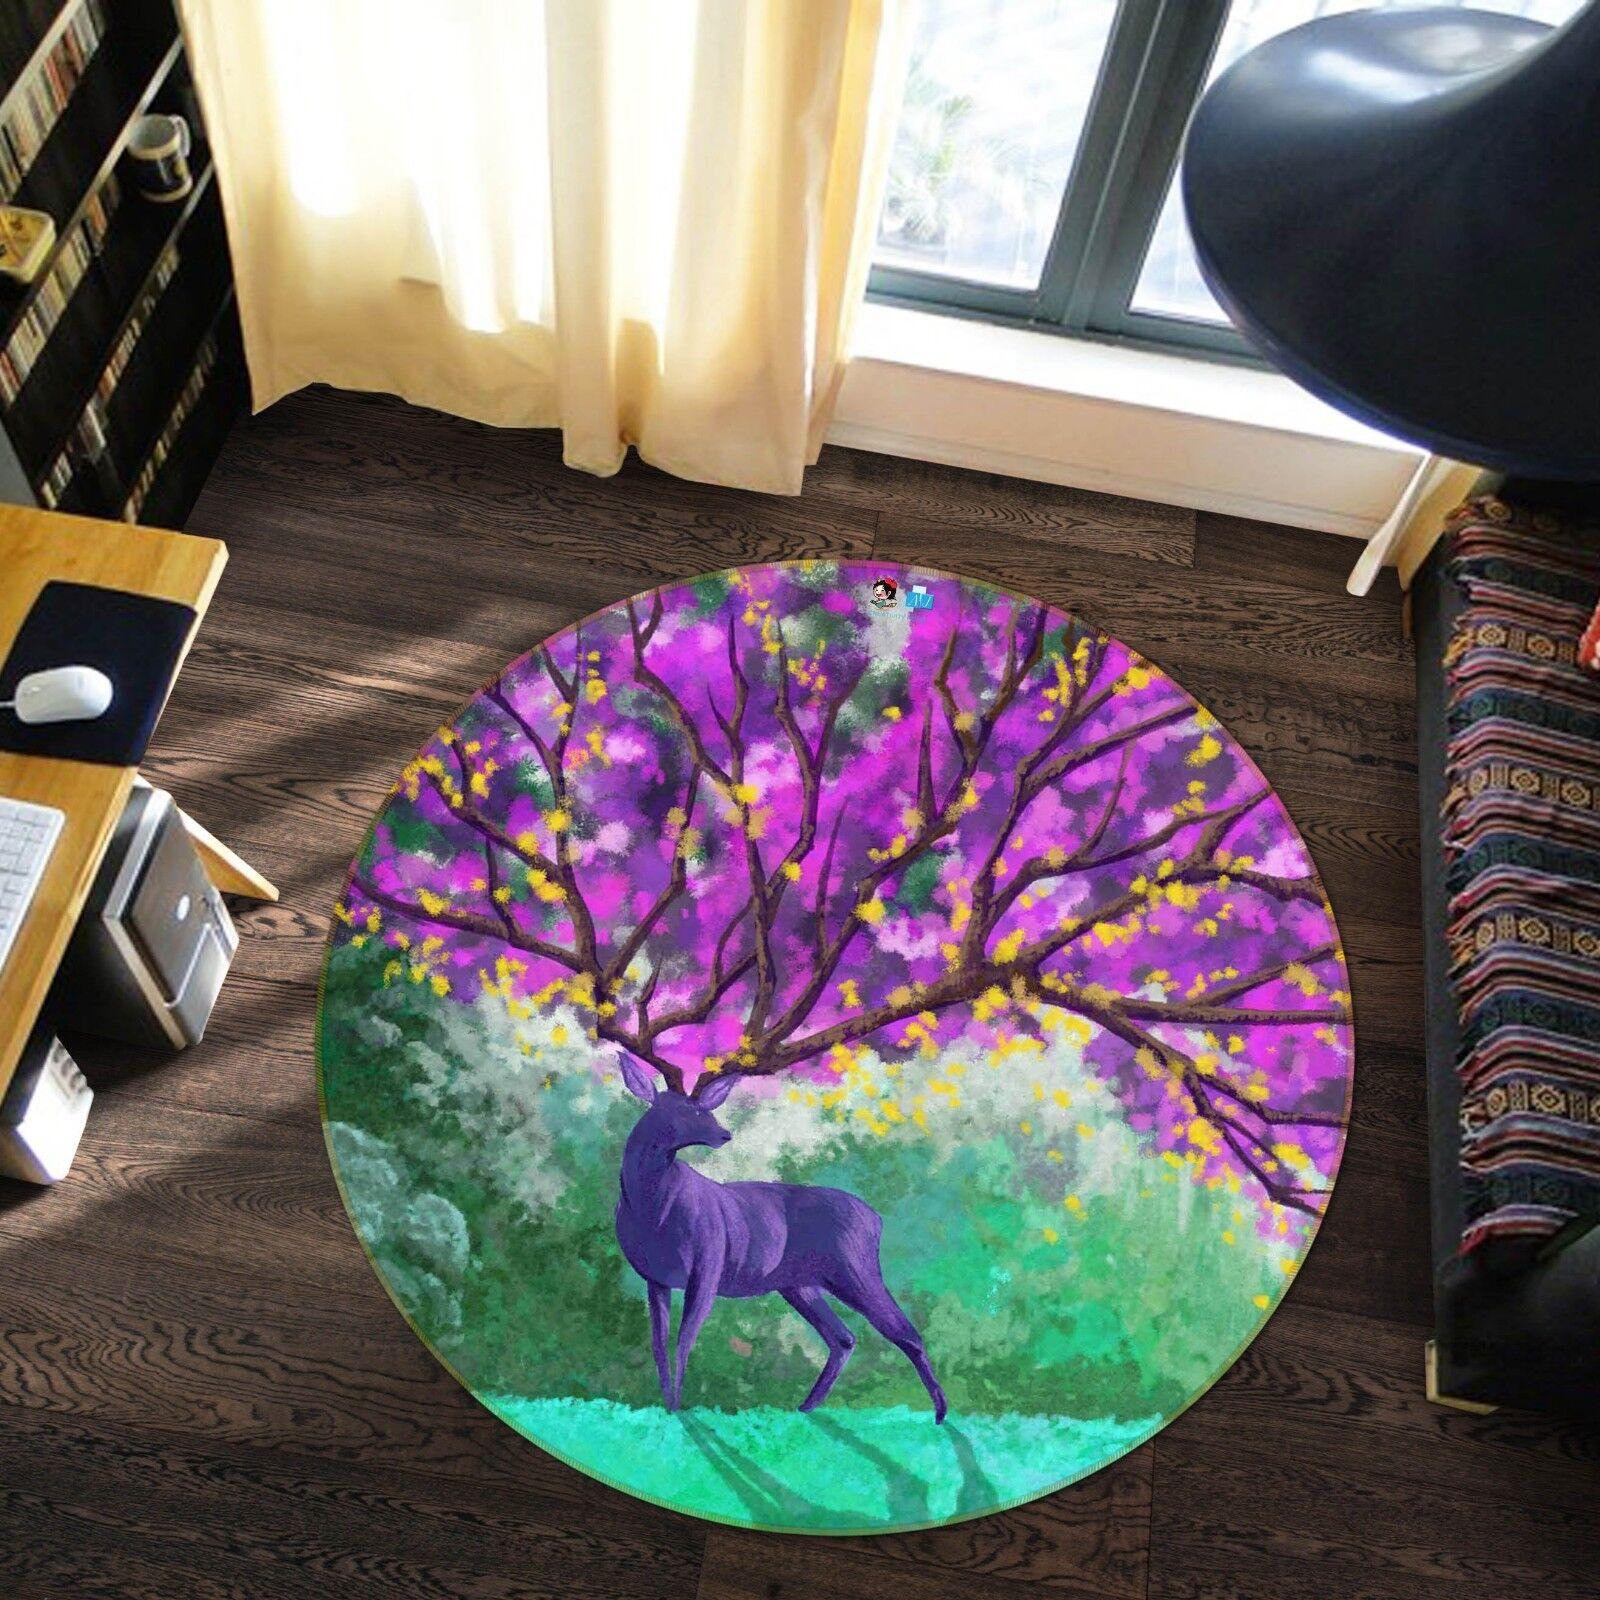 3d árbol púrpura Hirsch 5 antideslizante alfombra de maletero rondas elegante alfombra